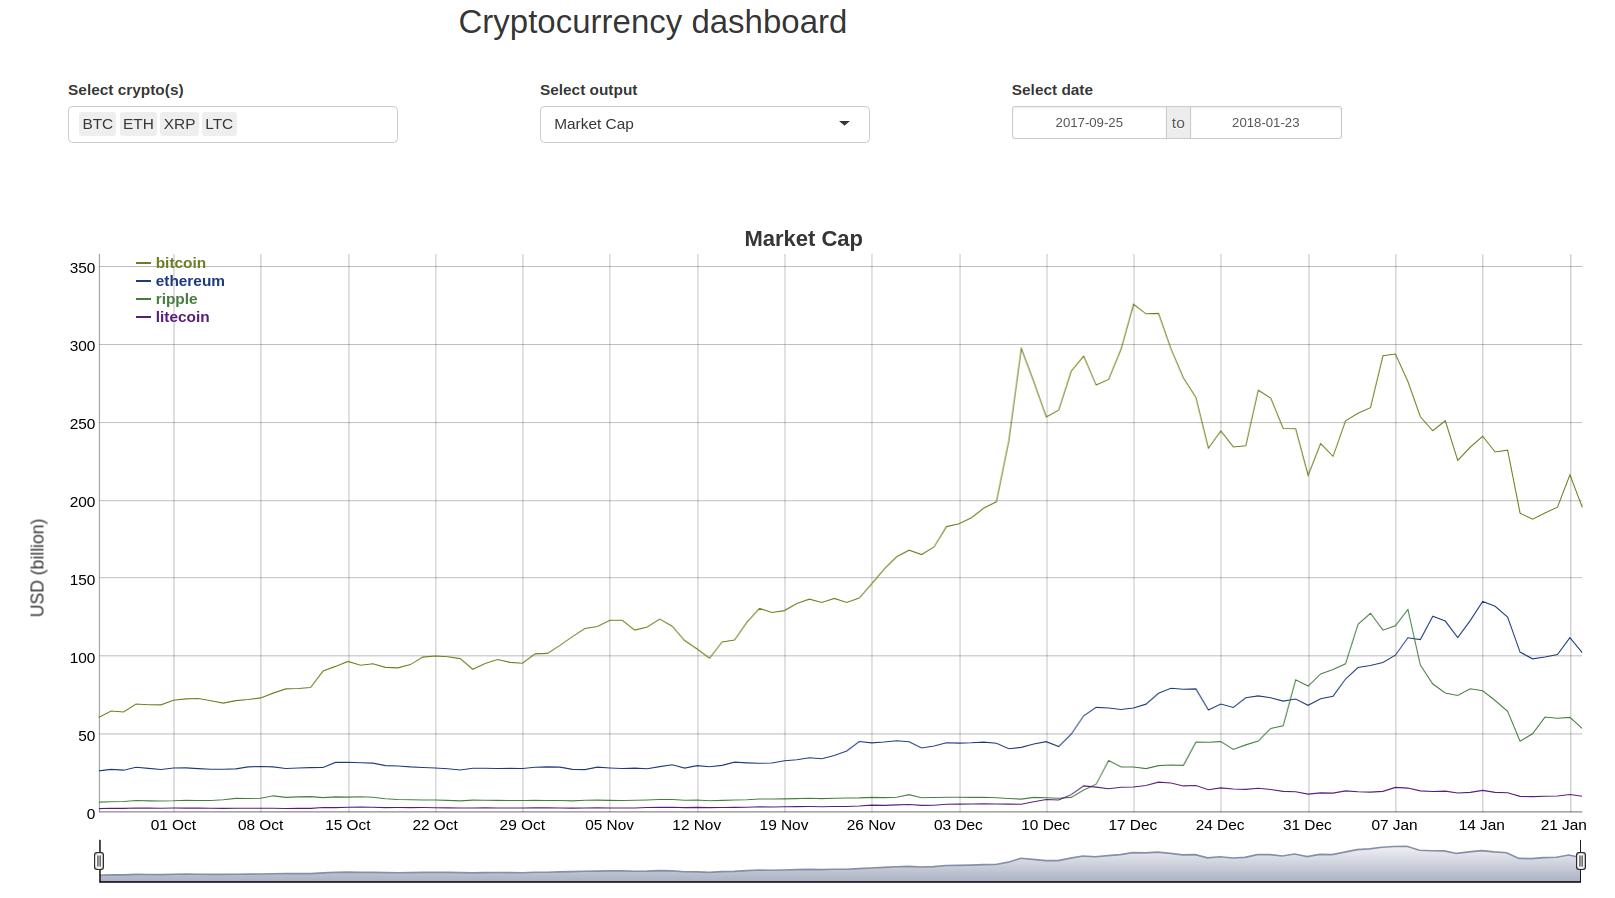 Tutorial: Crypto dashboard in R shiny - Ger Inberg